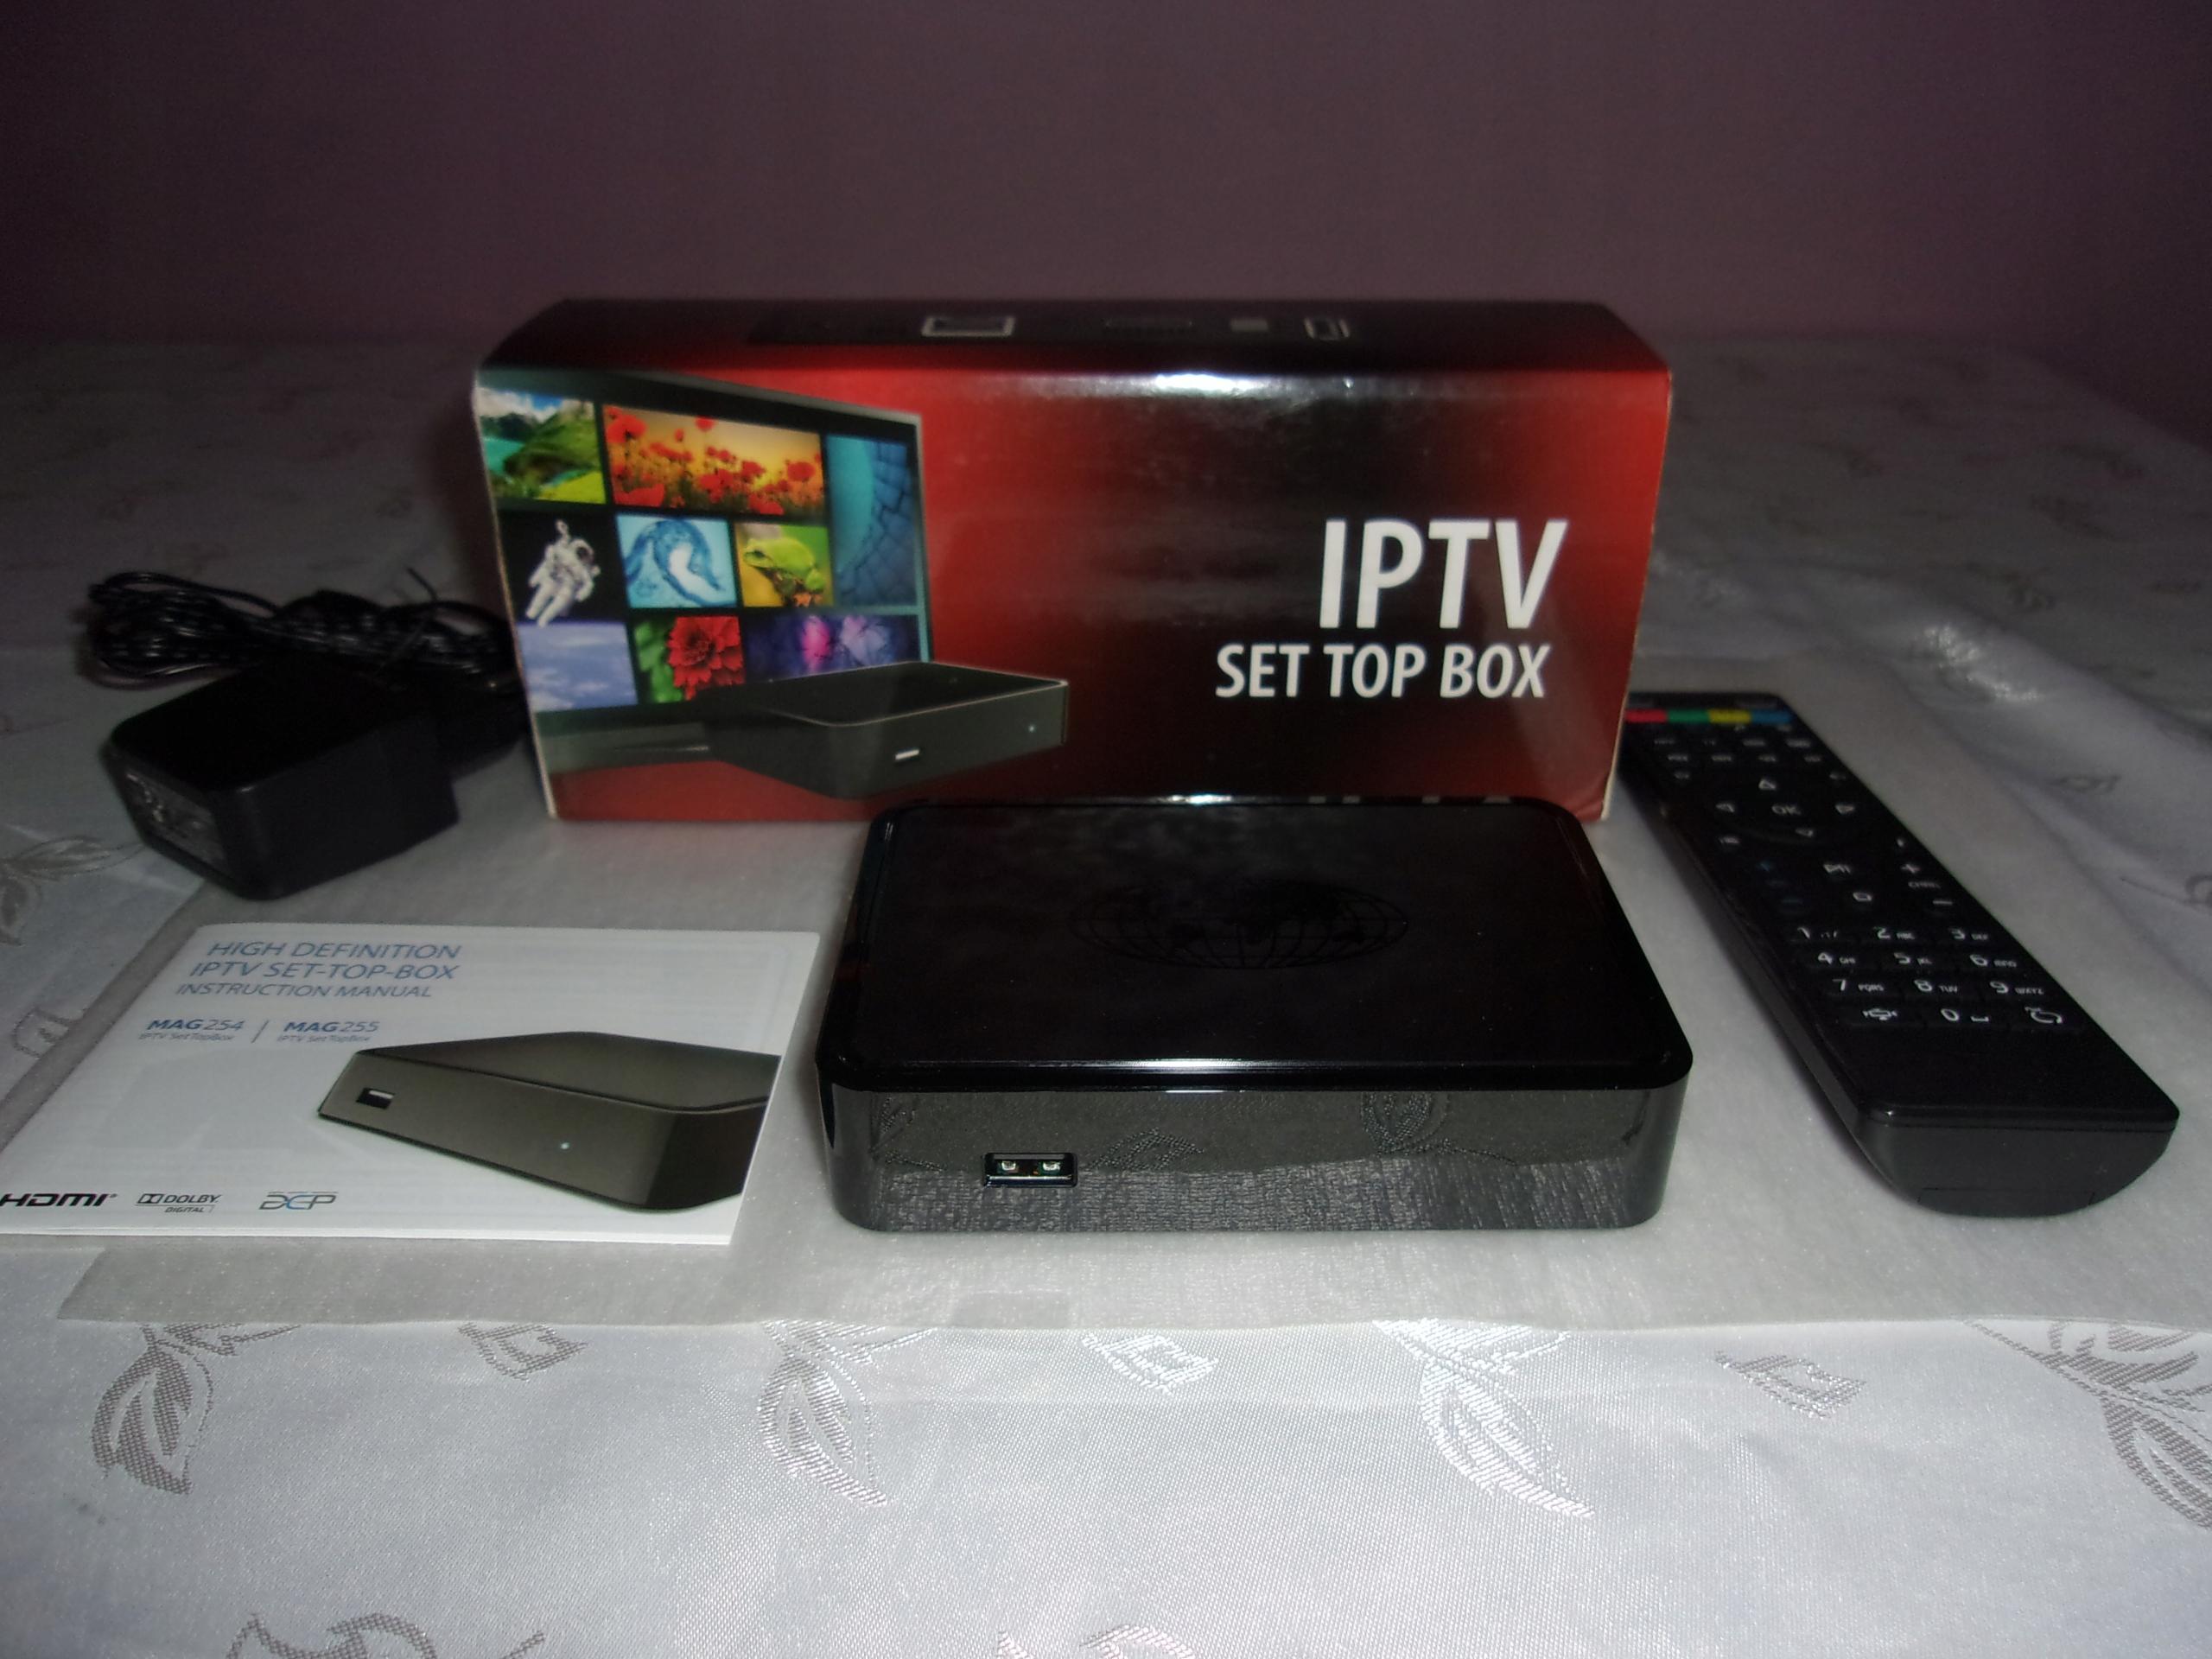 MAG 254 HD IM INFOMIR IPTV SET TOP BOX TV INTERNET - 7858102011